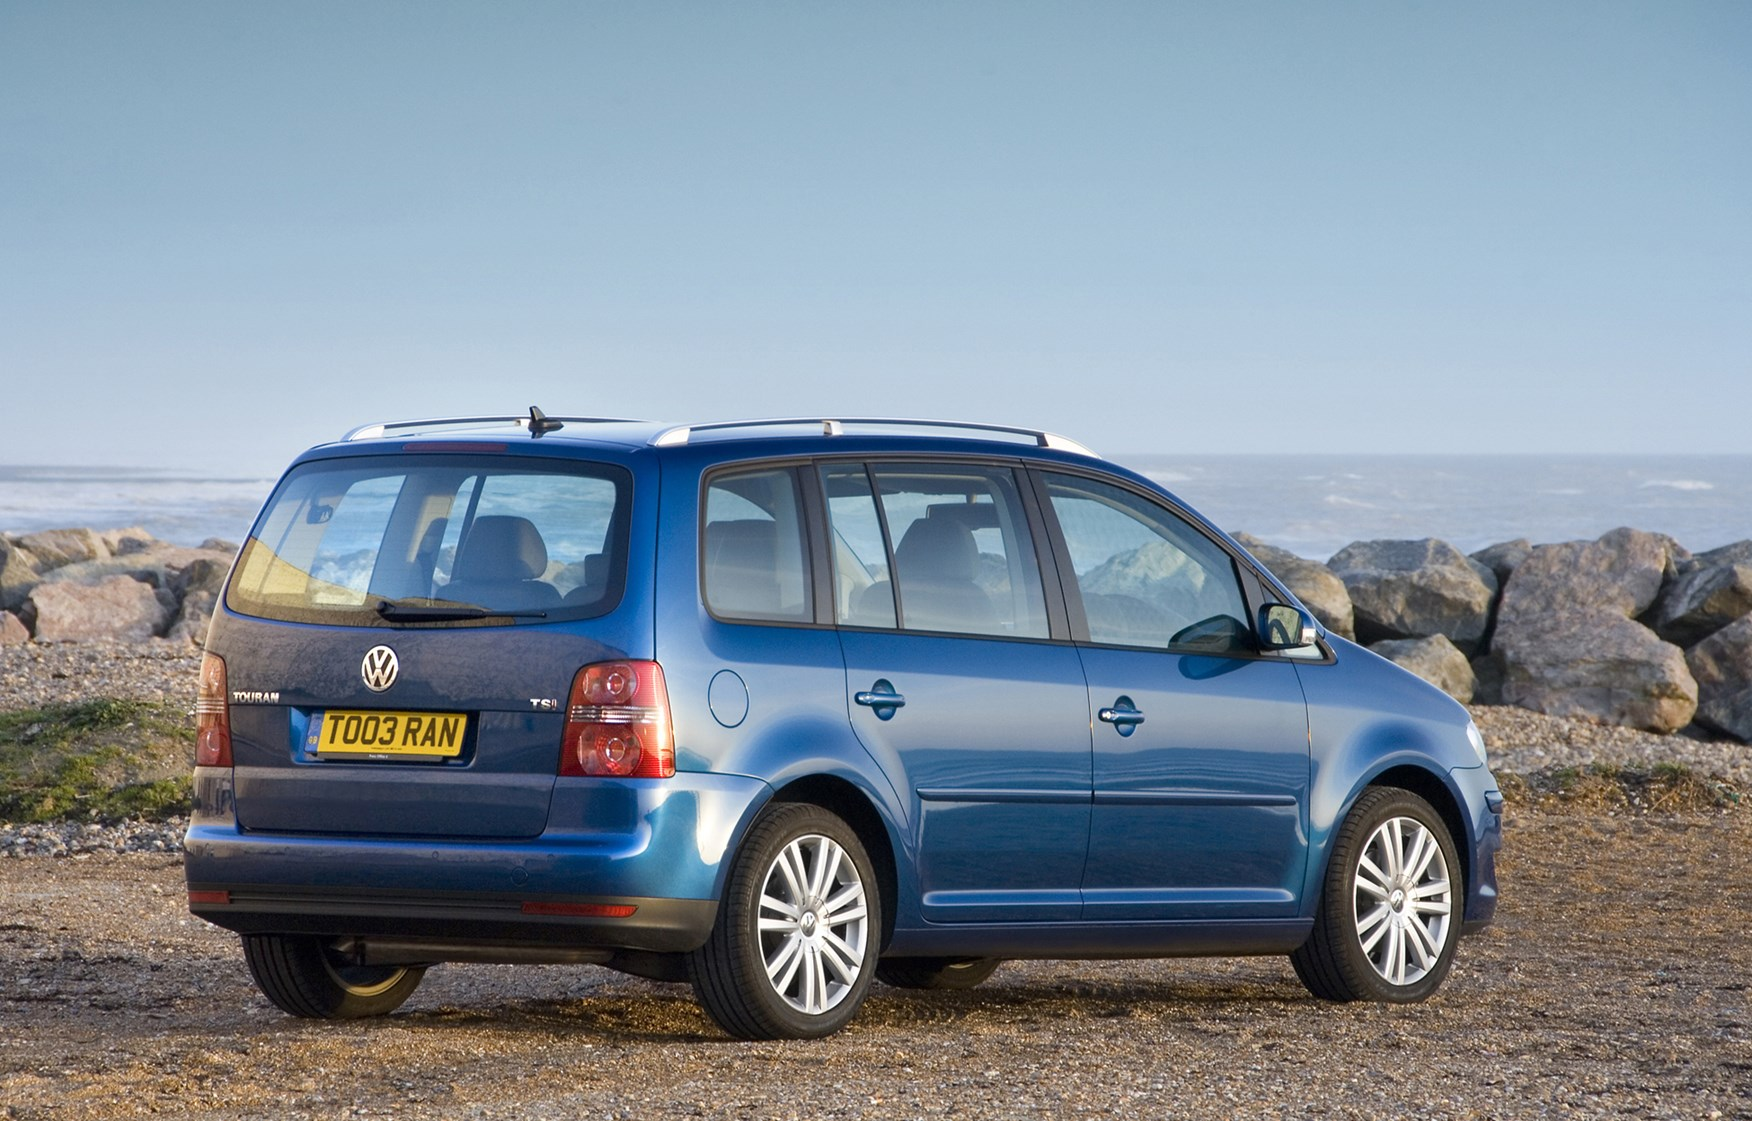 Volkswagen Touran I 2003 - 2006 Compact MPV #3